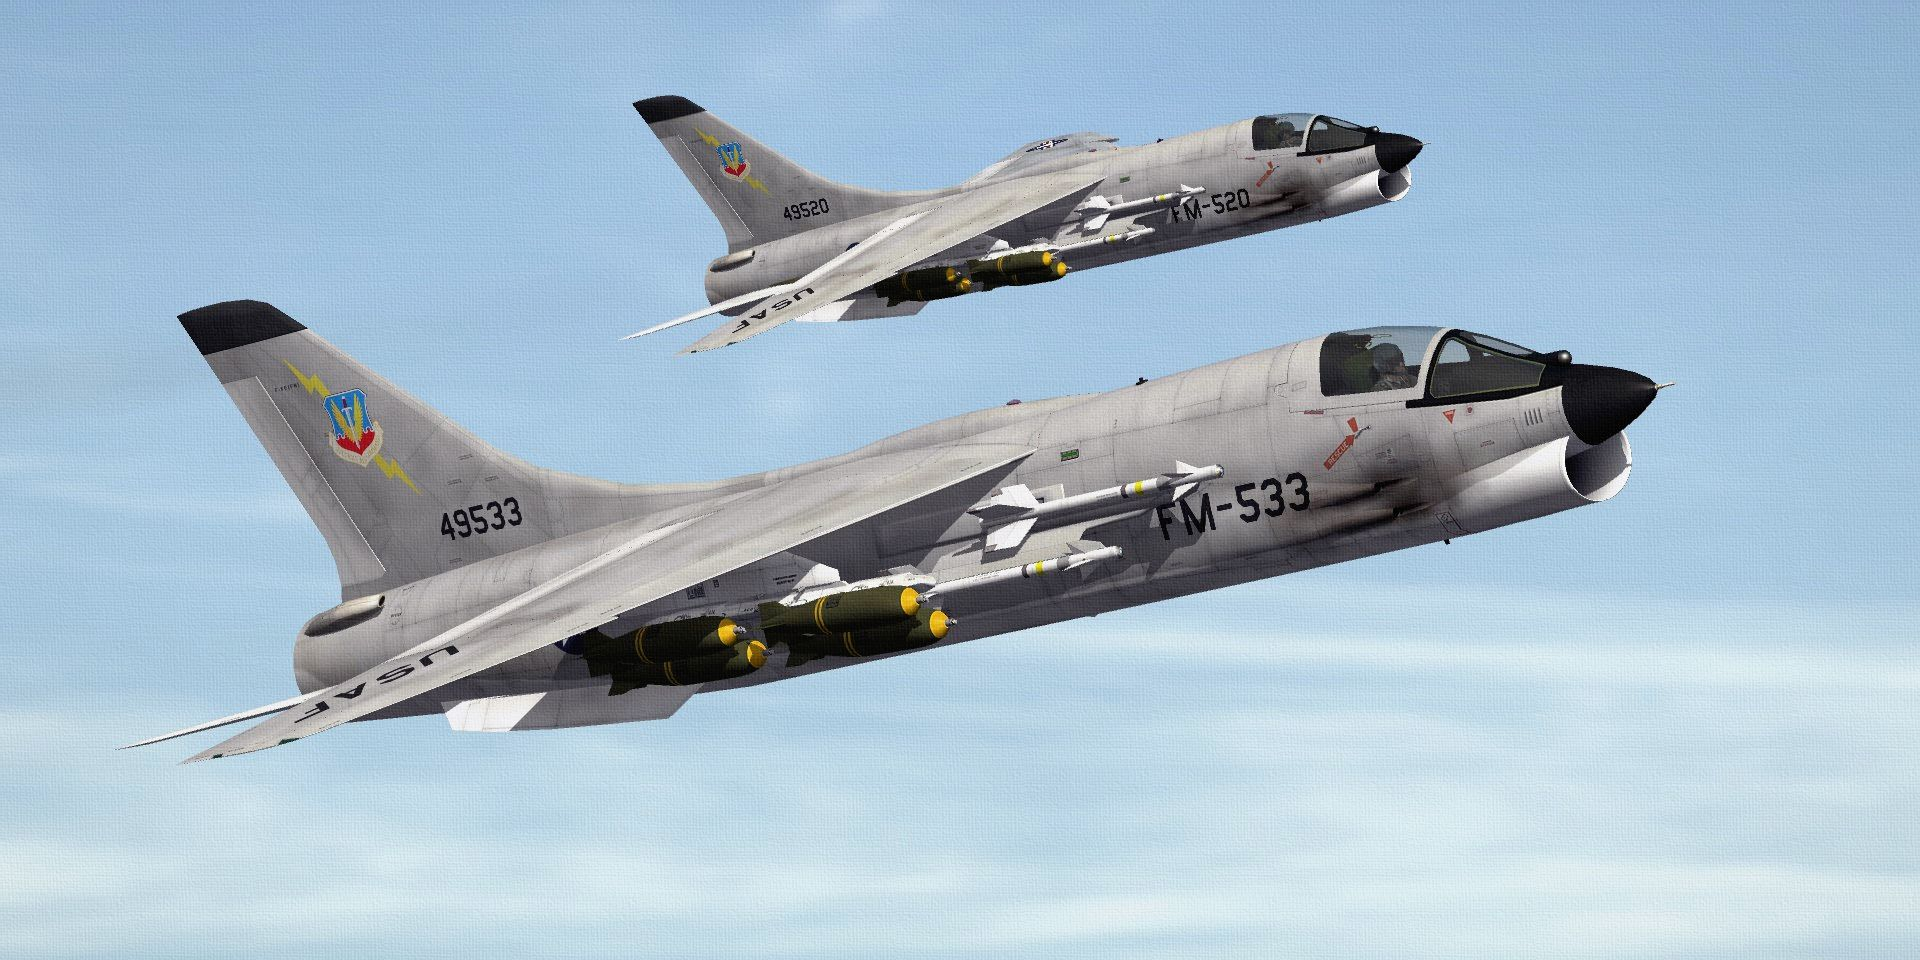 USAFF-8FCRUSADER06_zpsc93b0067.jpg